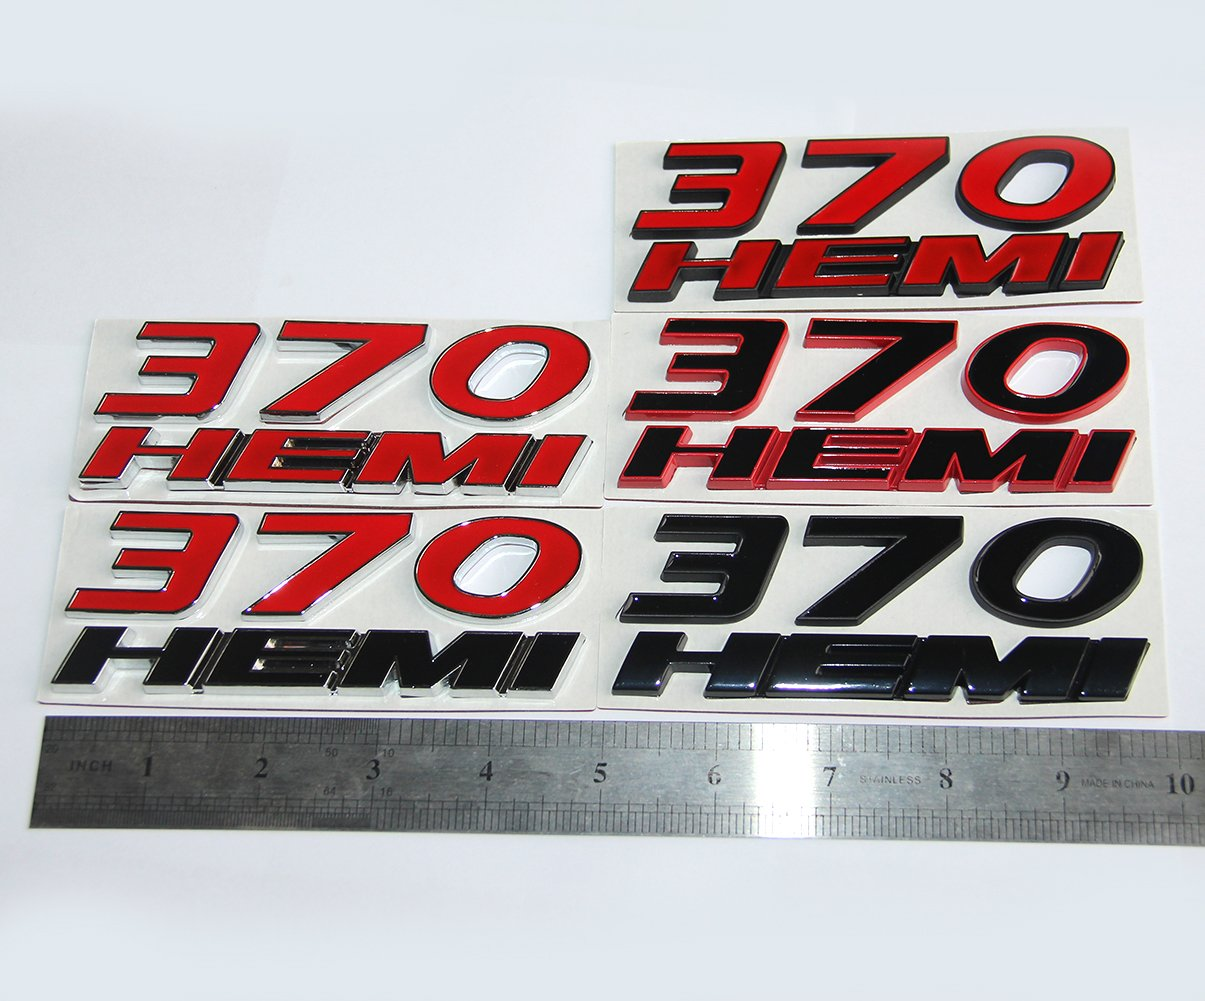 Yoaoo 2x OEM 370 HEMI Emblem Badges 3d Logo for HEMI Dodge Challenger Chrysle 300c Black Red